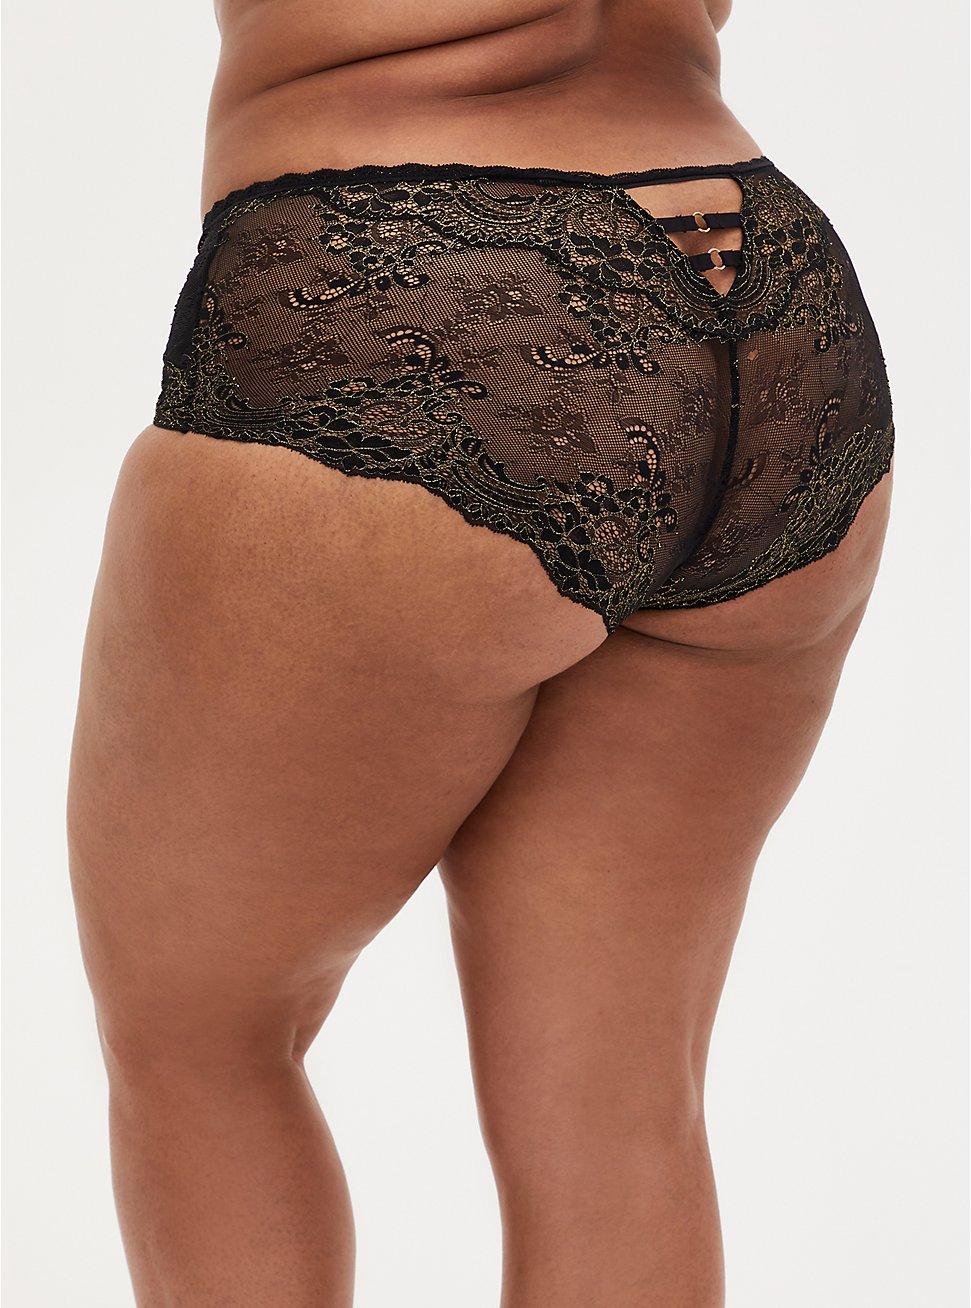 Black Lace Lattice Cheeky Panty , RICH BLACK, hi-res